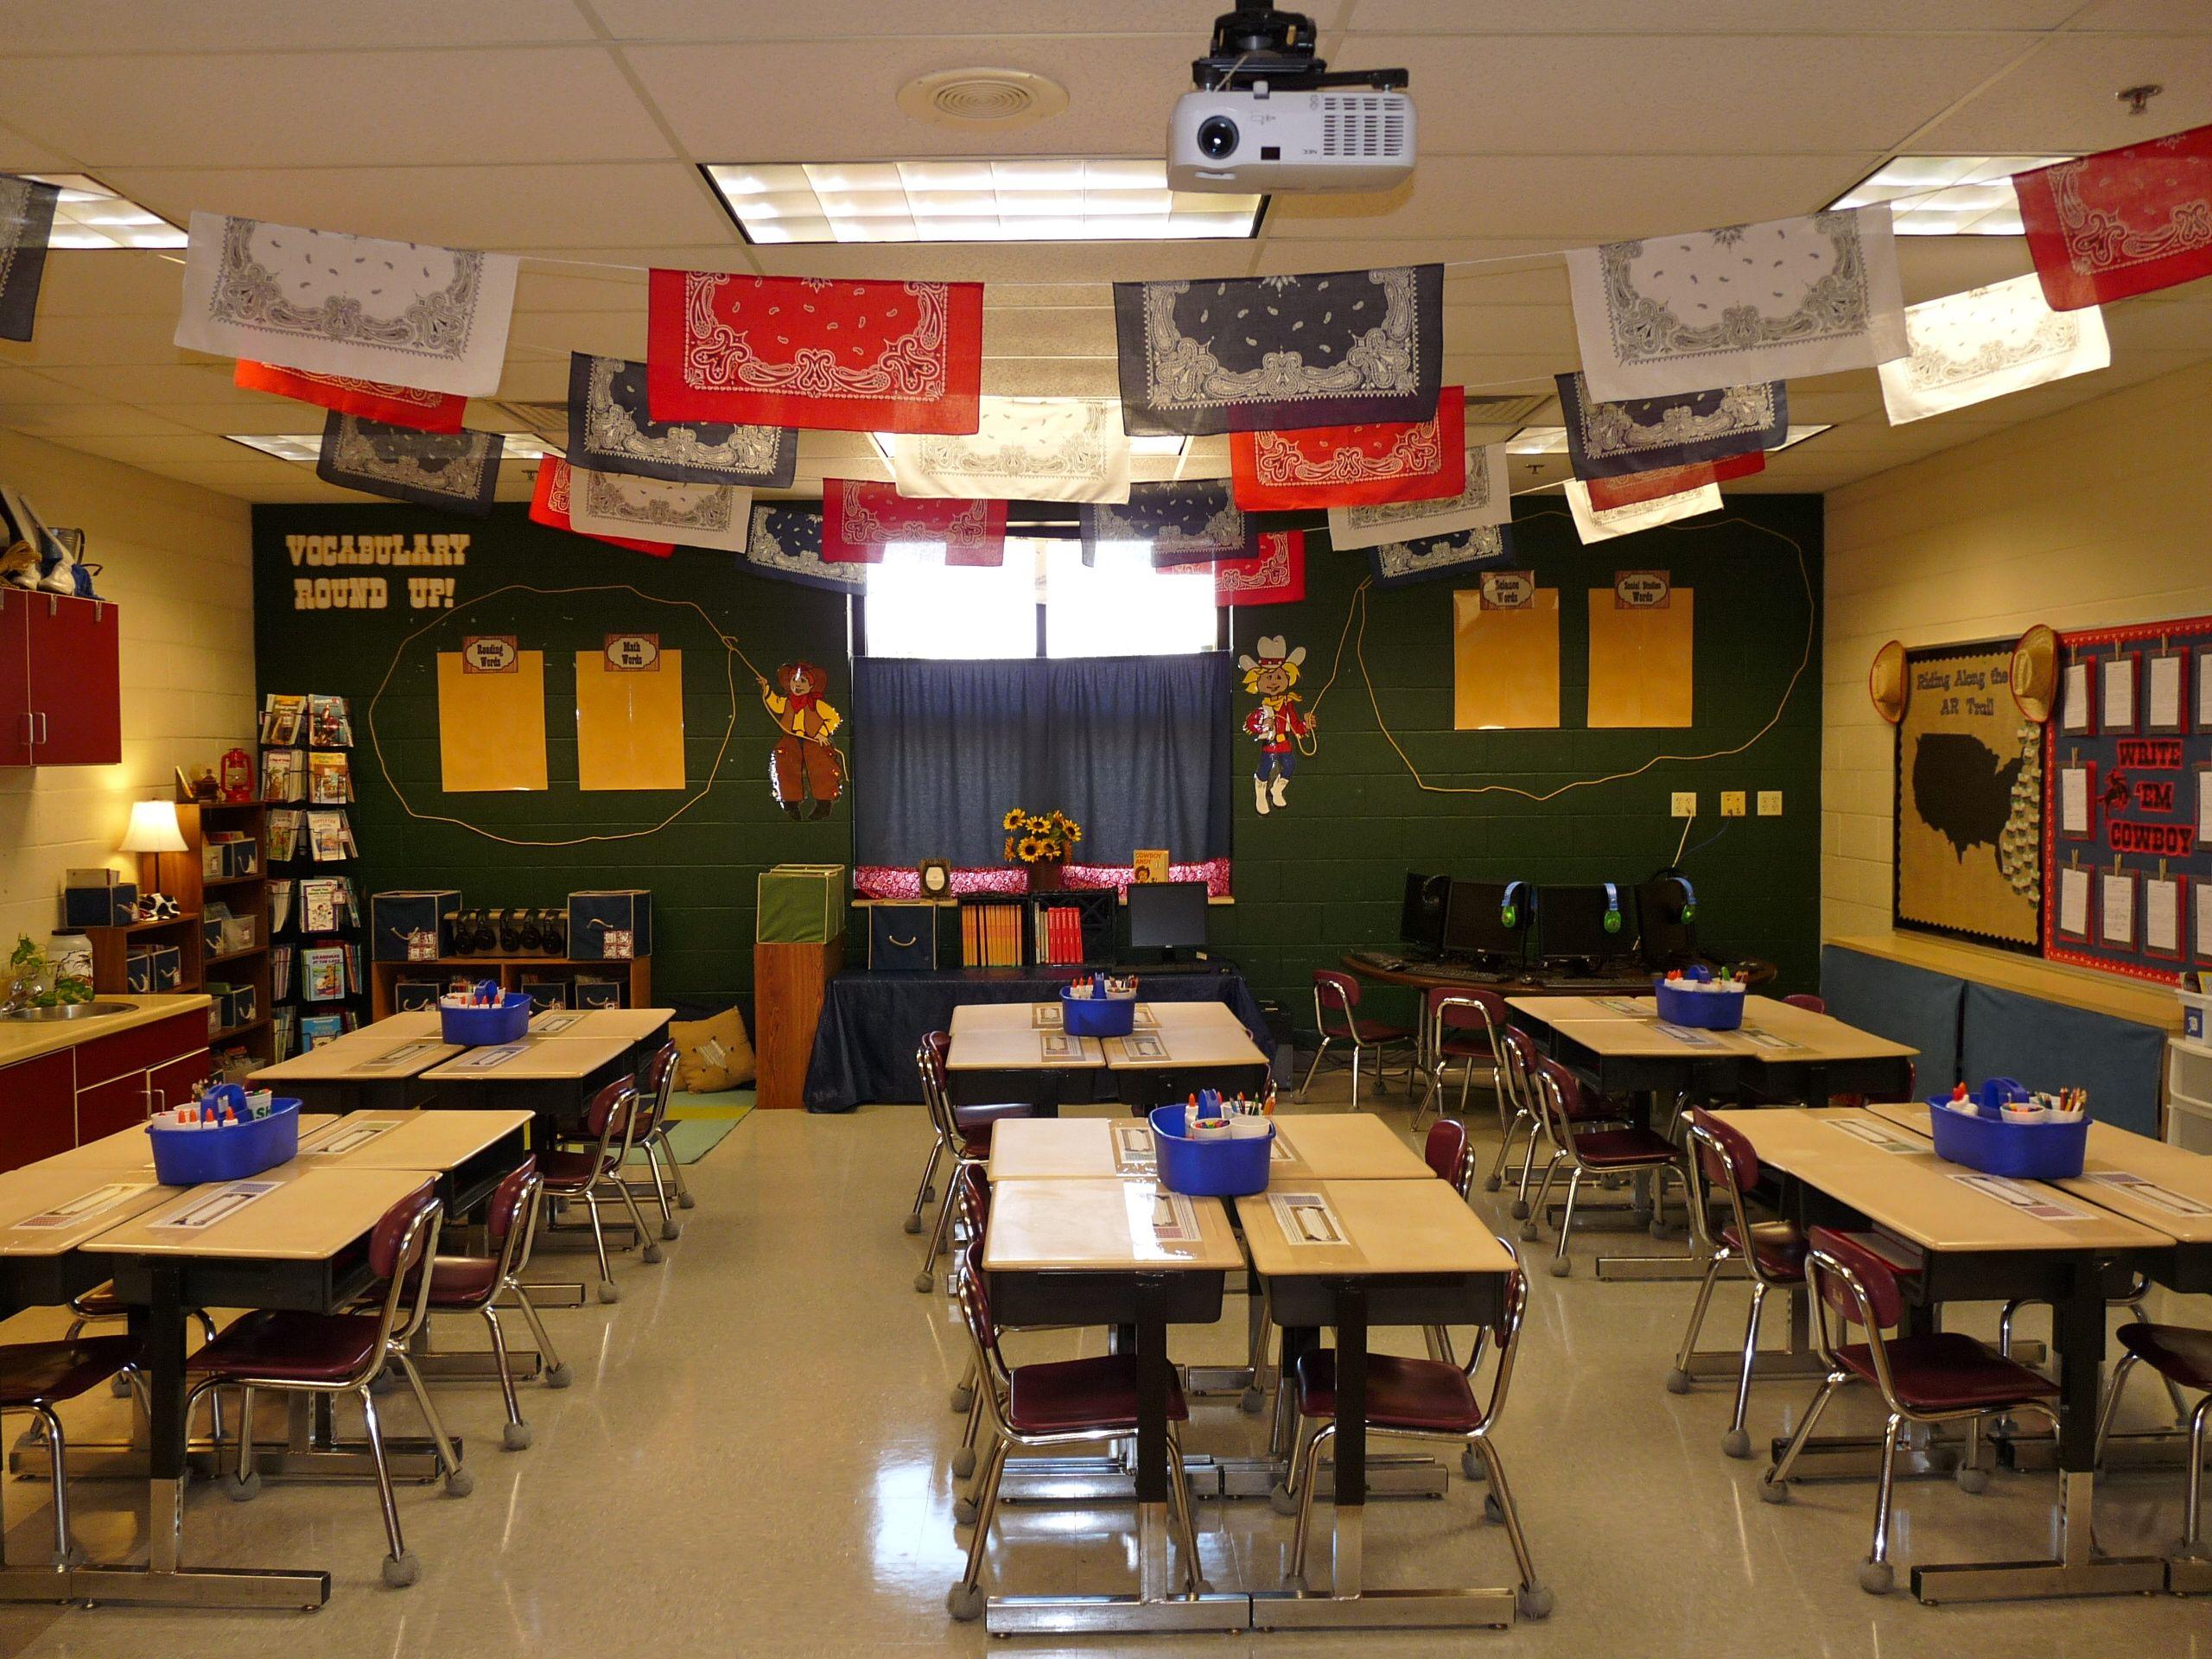 Western Classroom Decorations